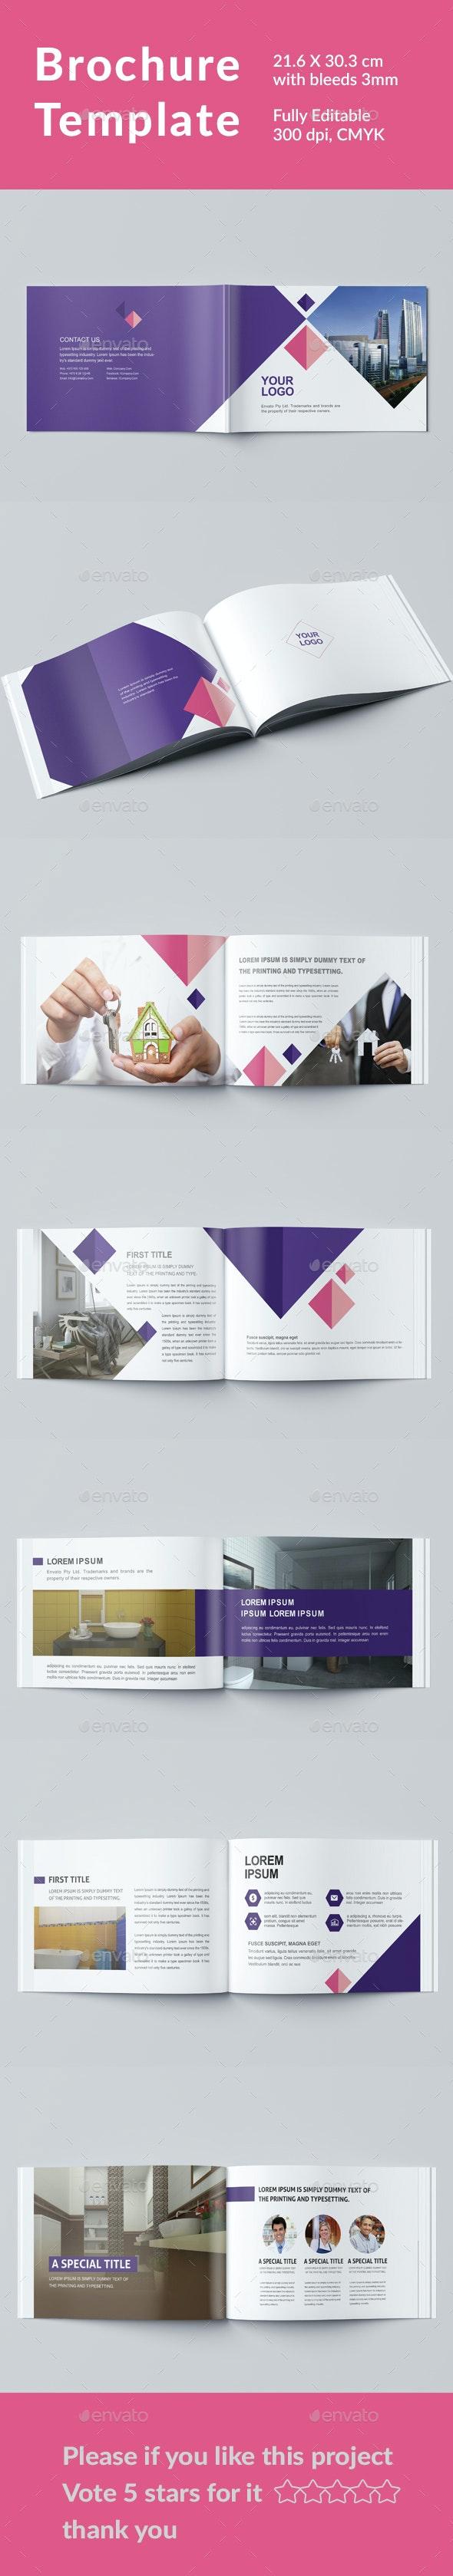 Brochure Template - Magazines Print Templates